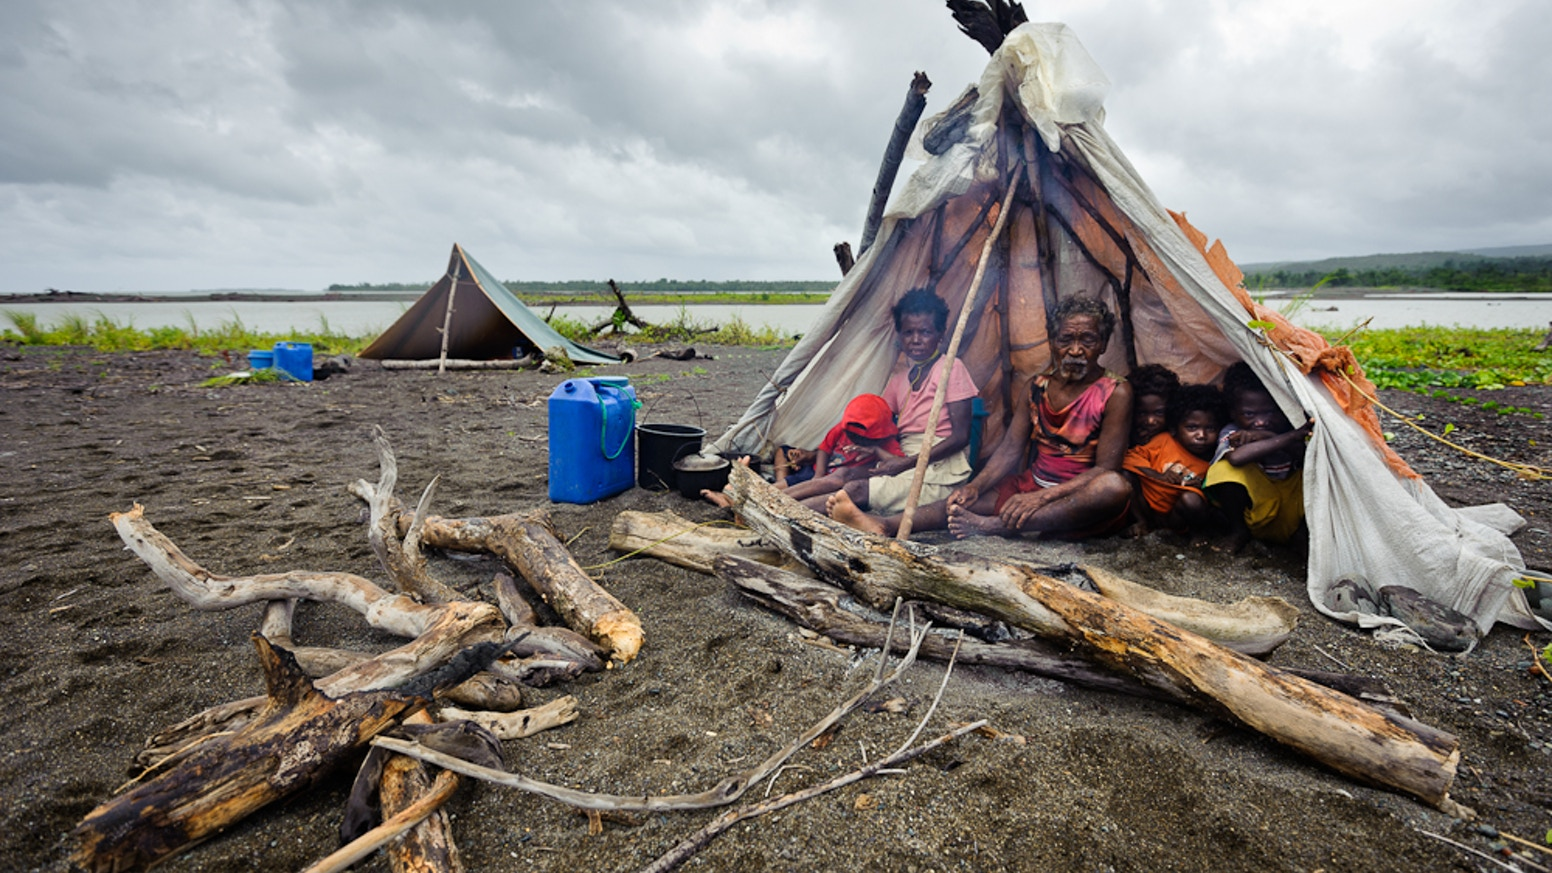 Katutubong Filipino Project: Vanishing Indigenous Cultures